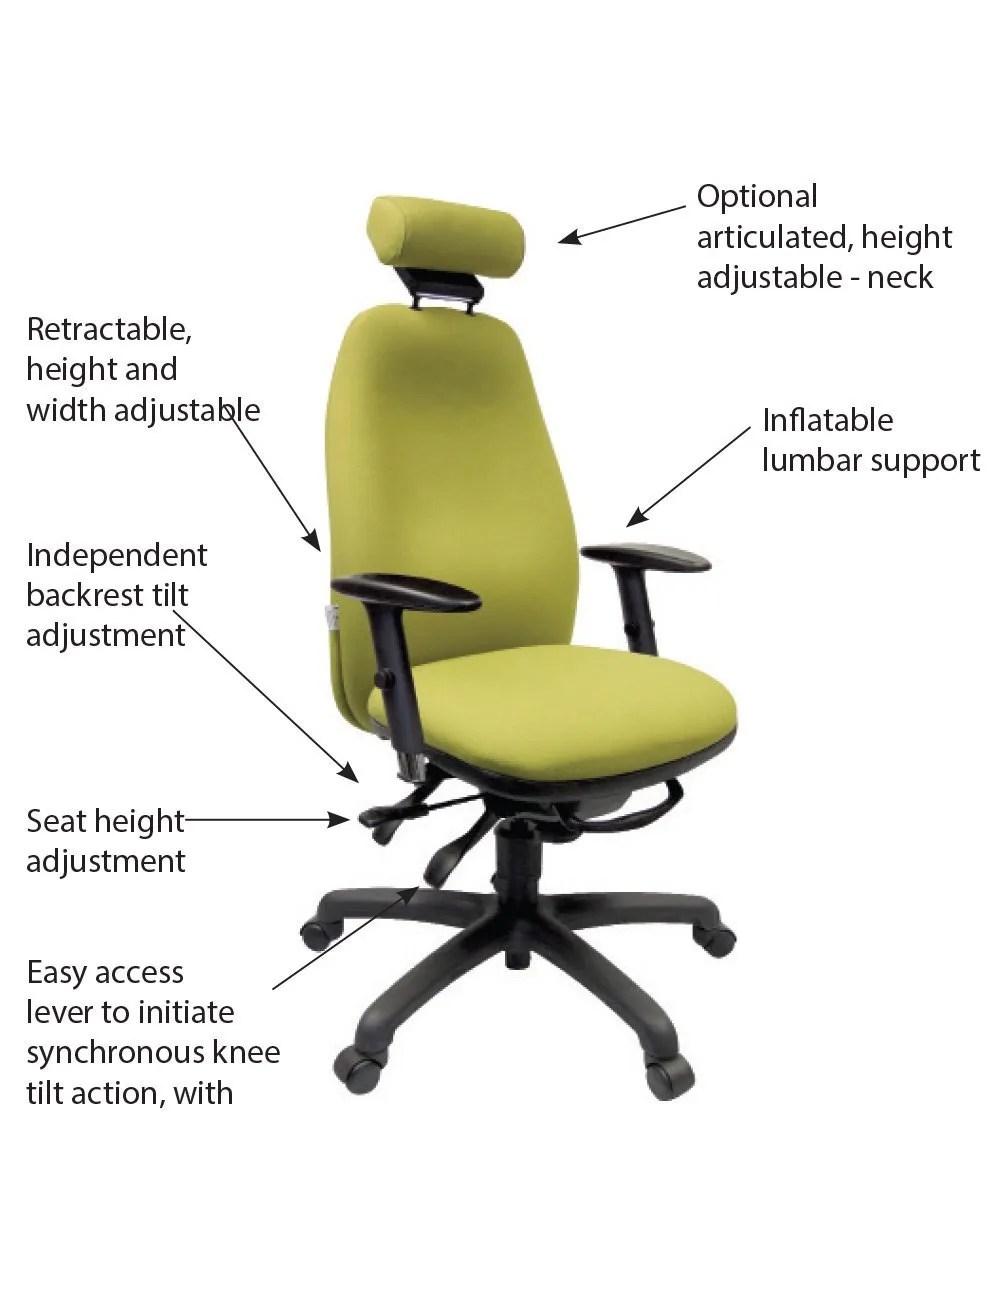 ergonomic chair criteria smartmotion swing nz adapt 620 online ergonomics